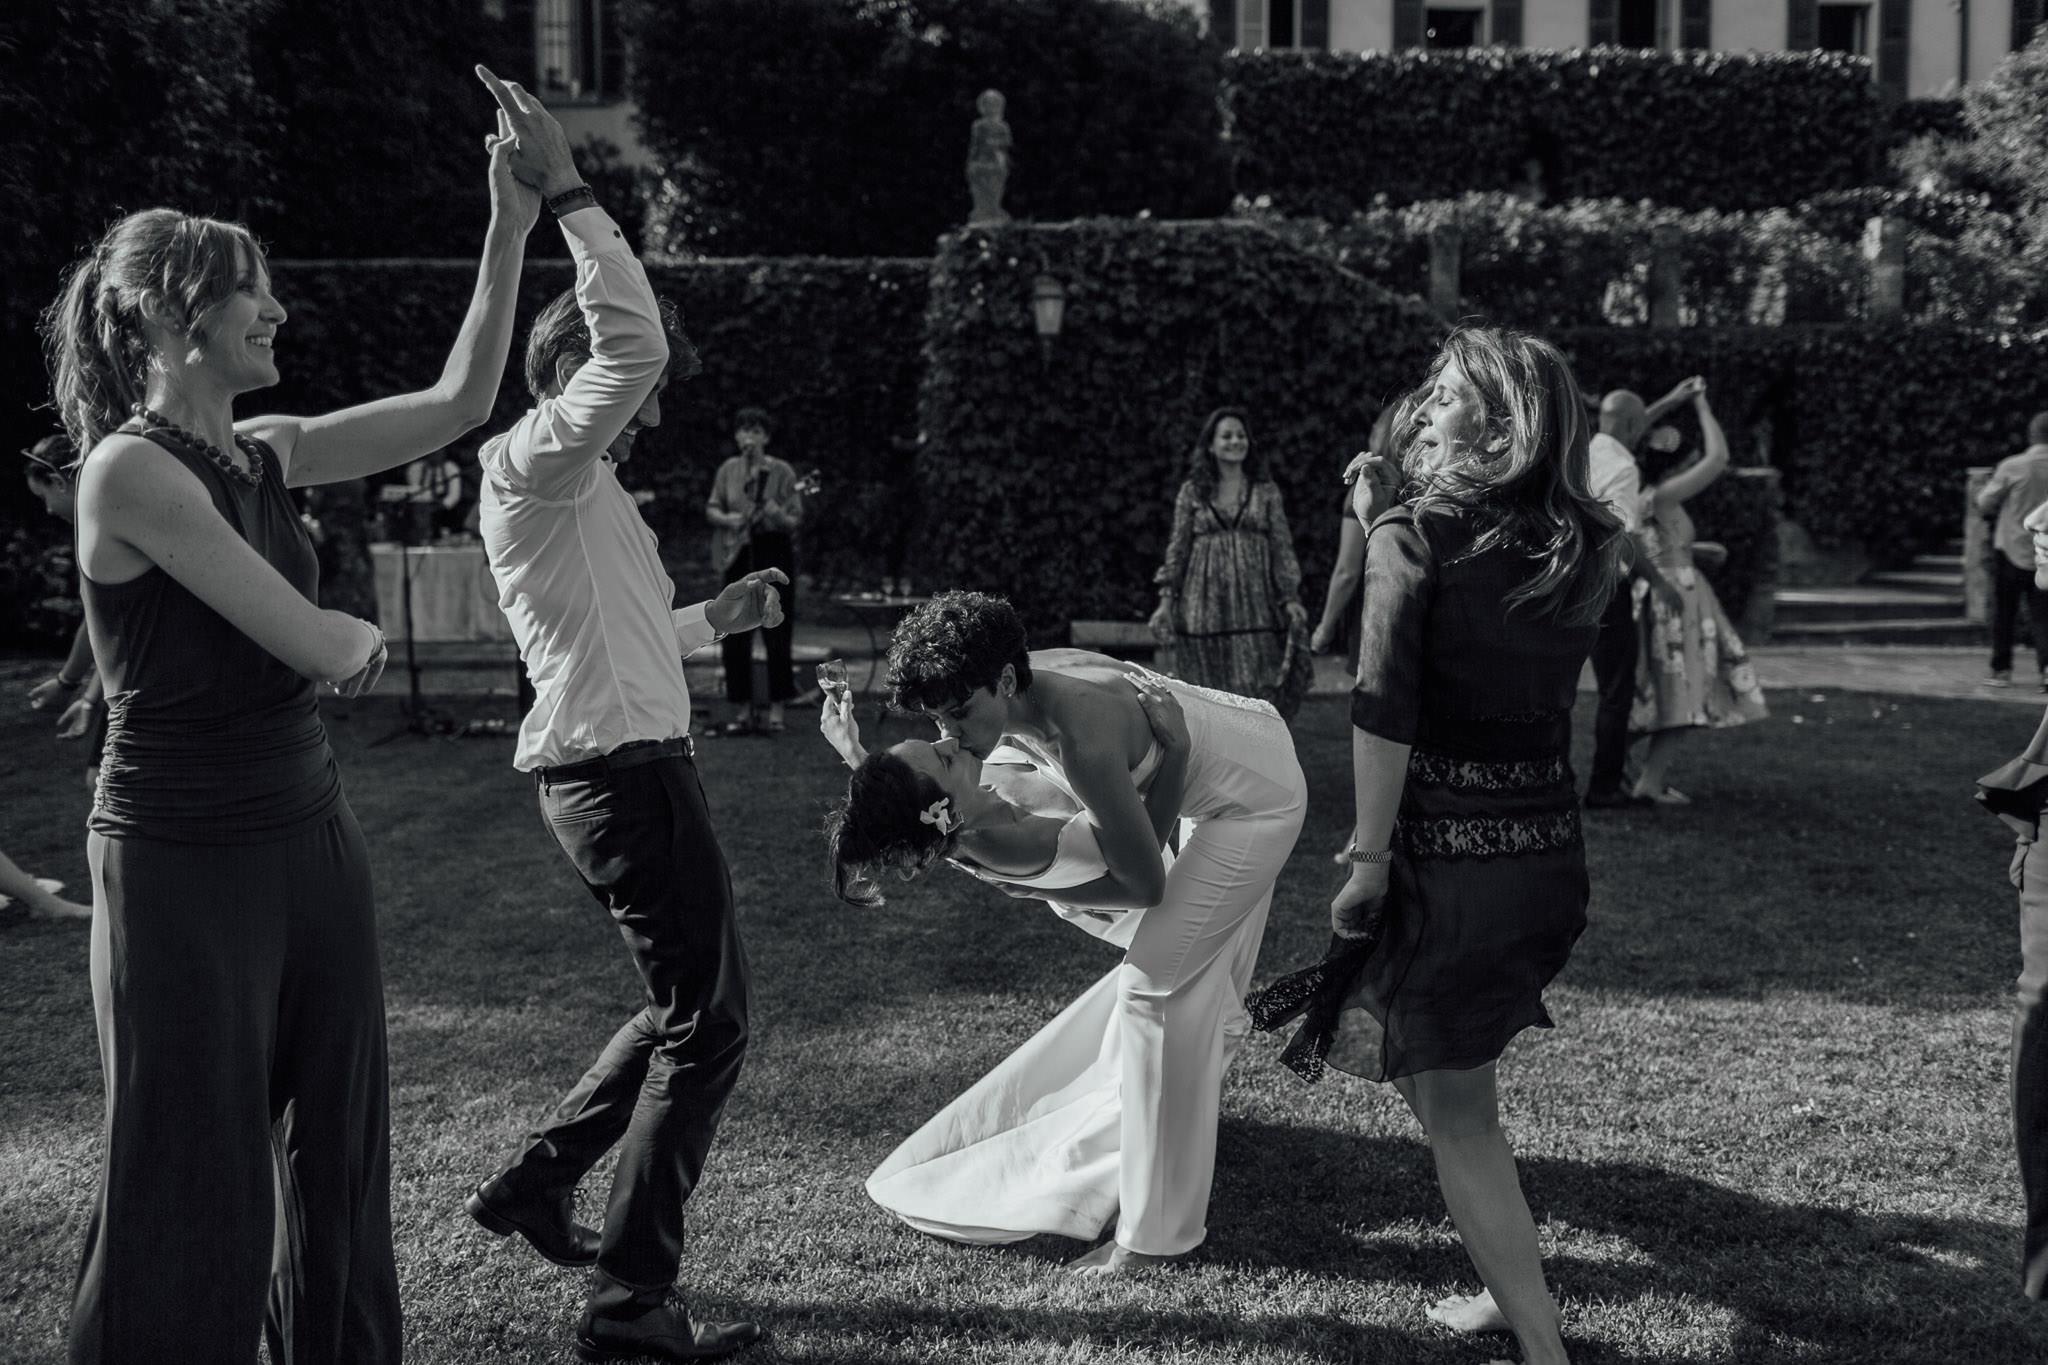 fotografia_di_matrimonio_portfolio-1117